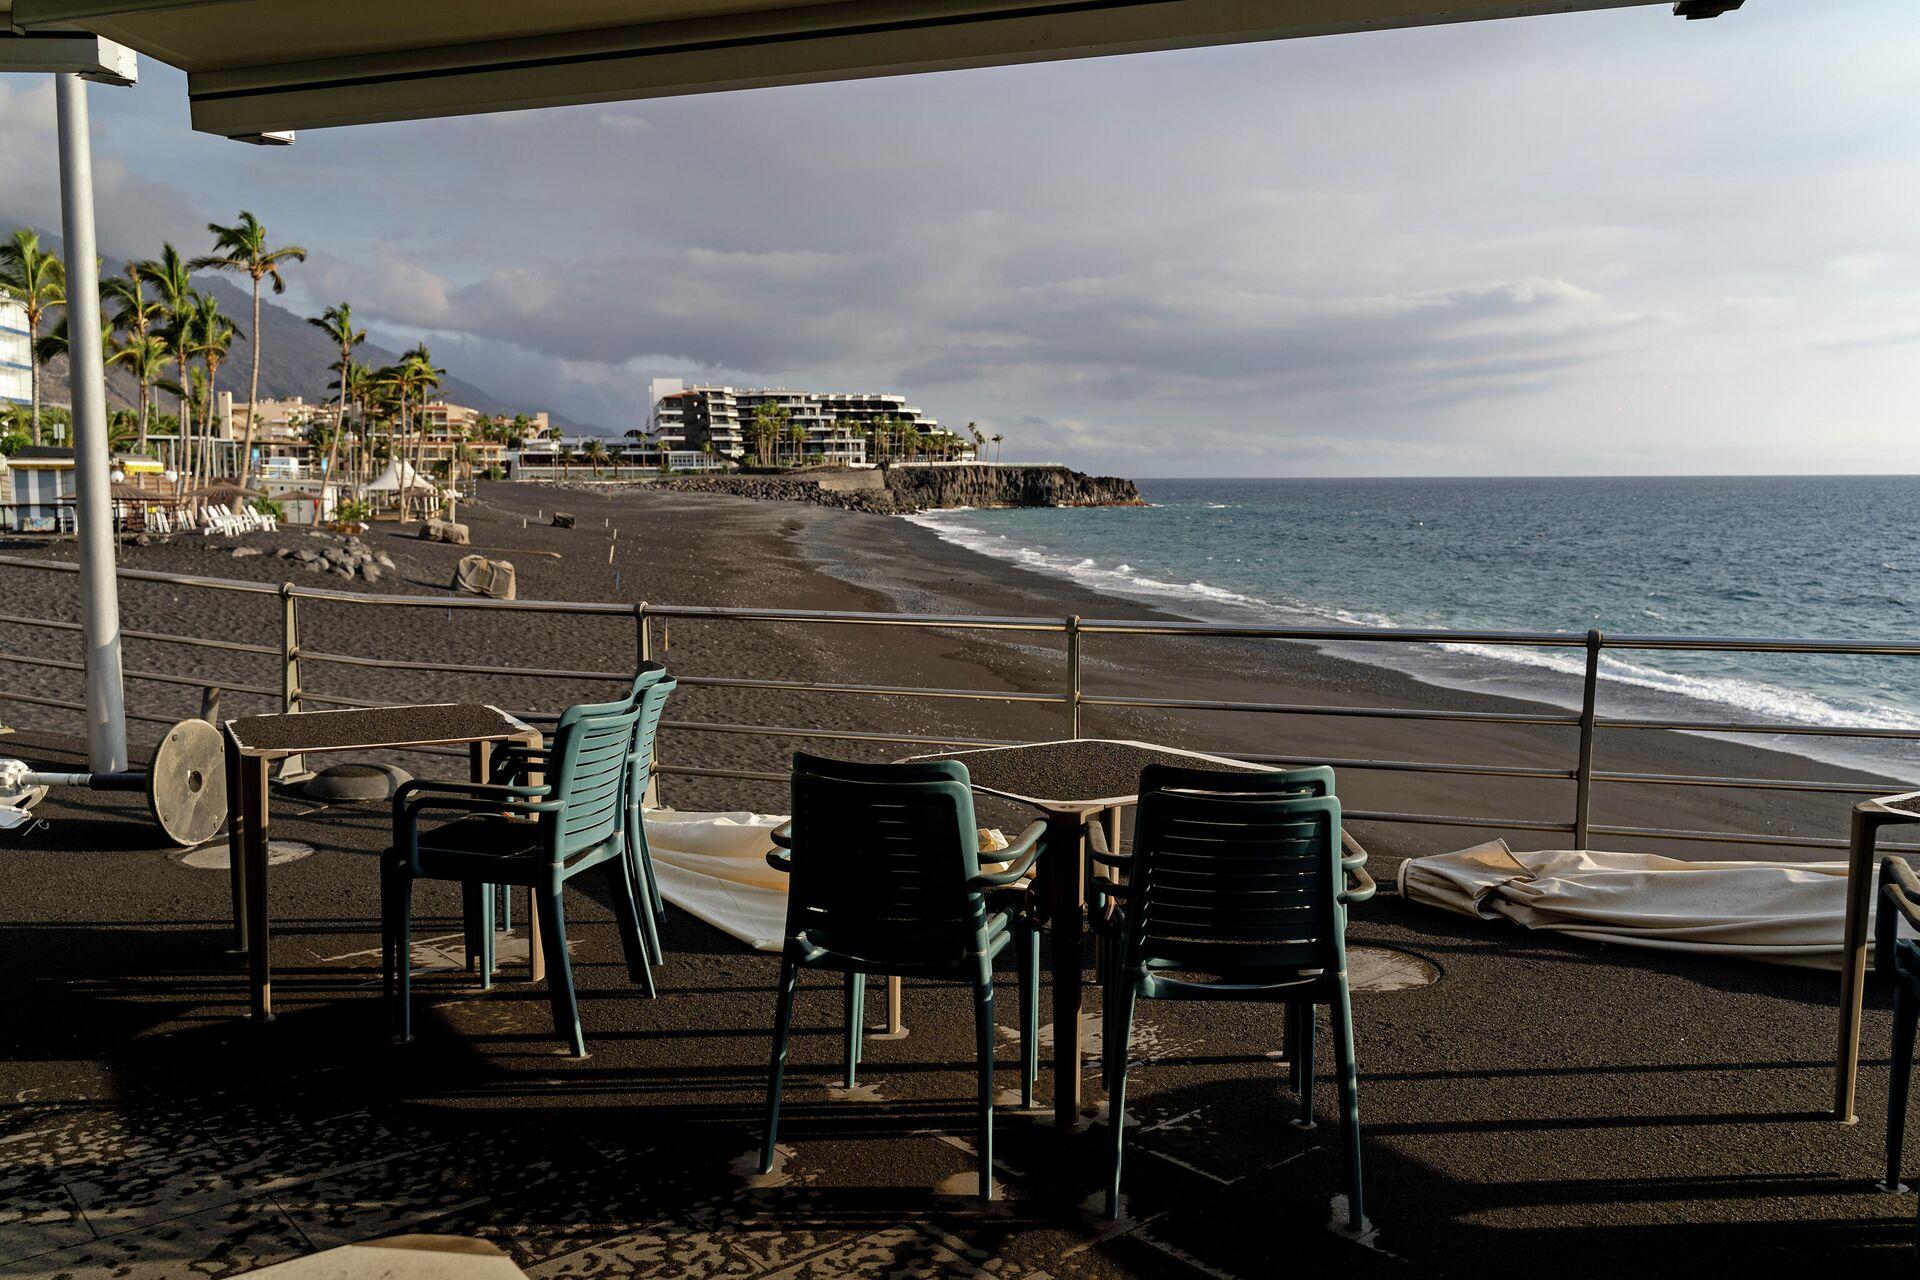 Terraza llena de ceniza en Puerto de Naos (La Palma) - Sputnik Mundo, 1920, 05.10.2021